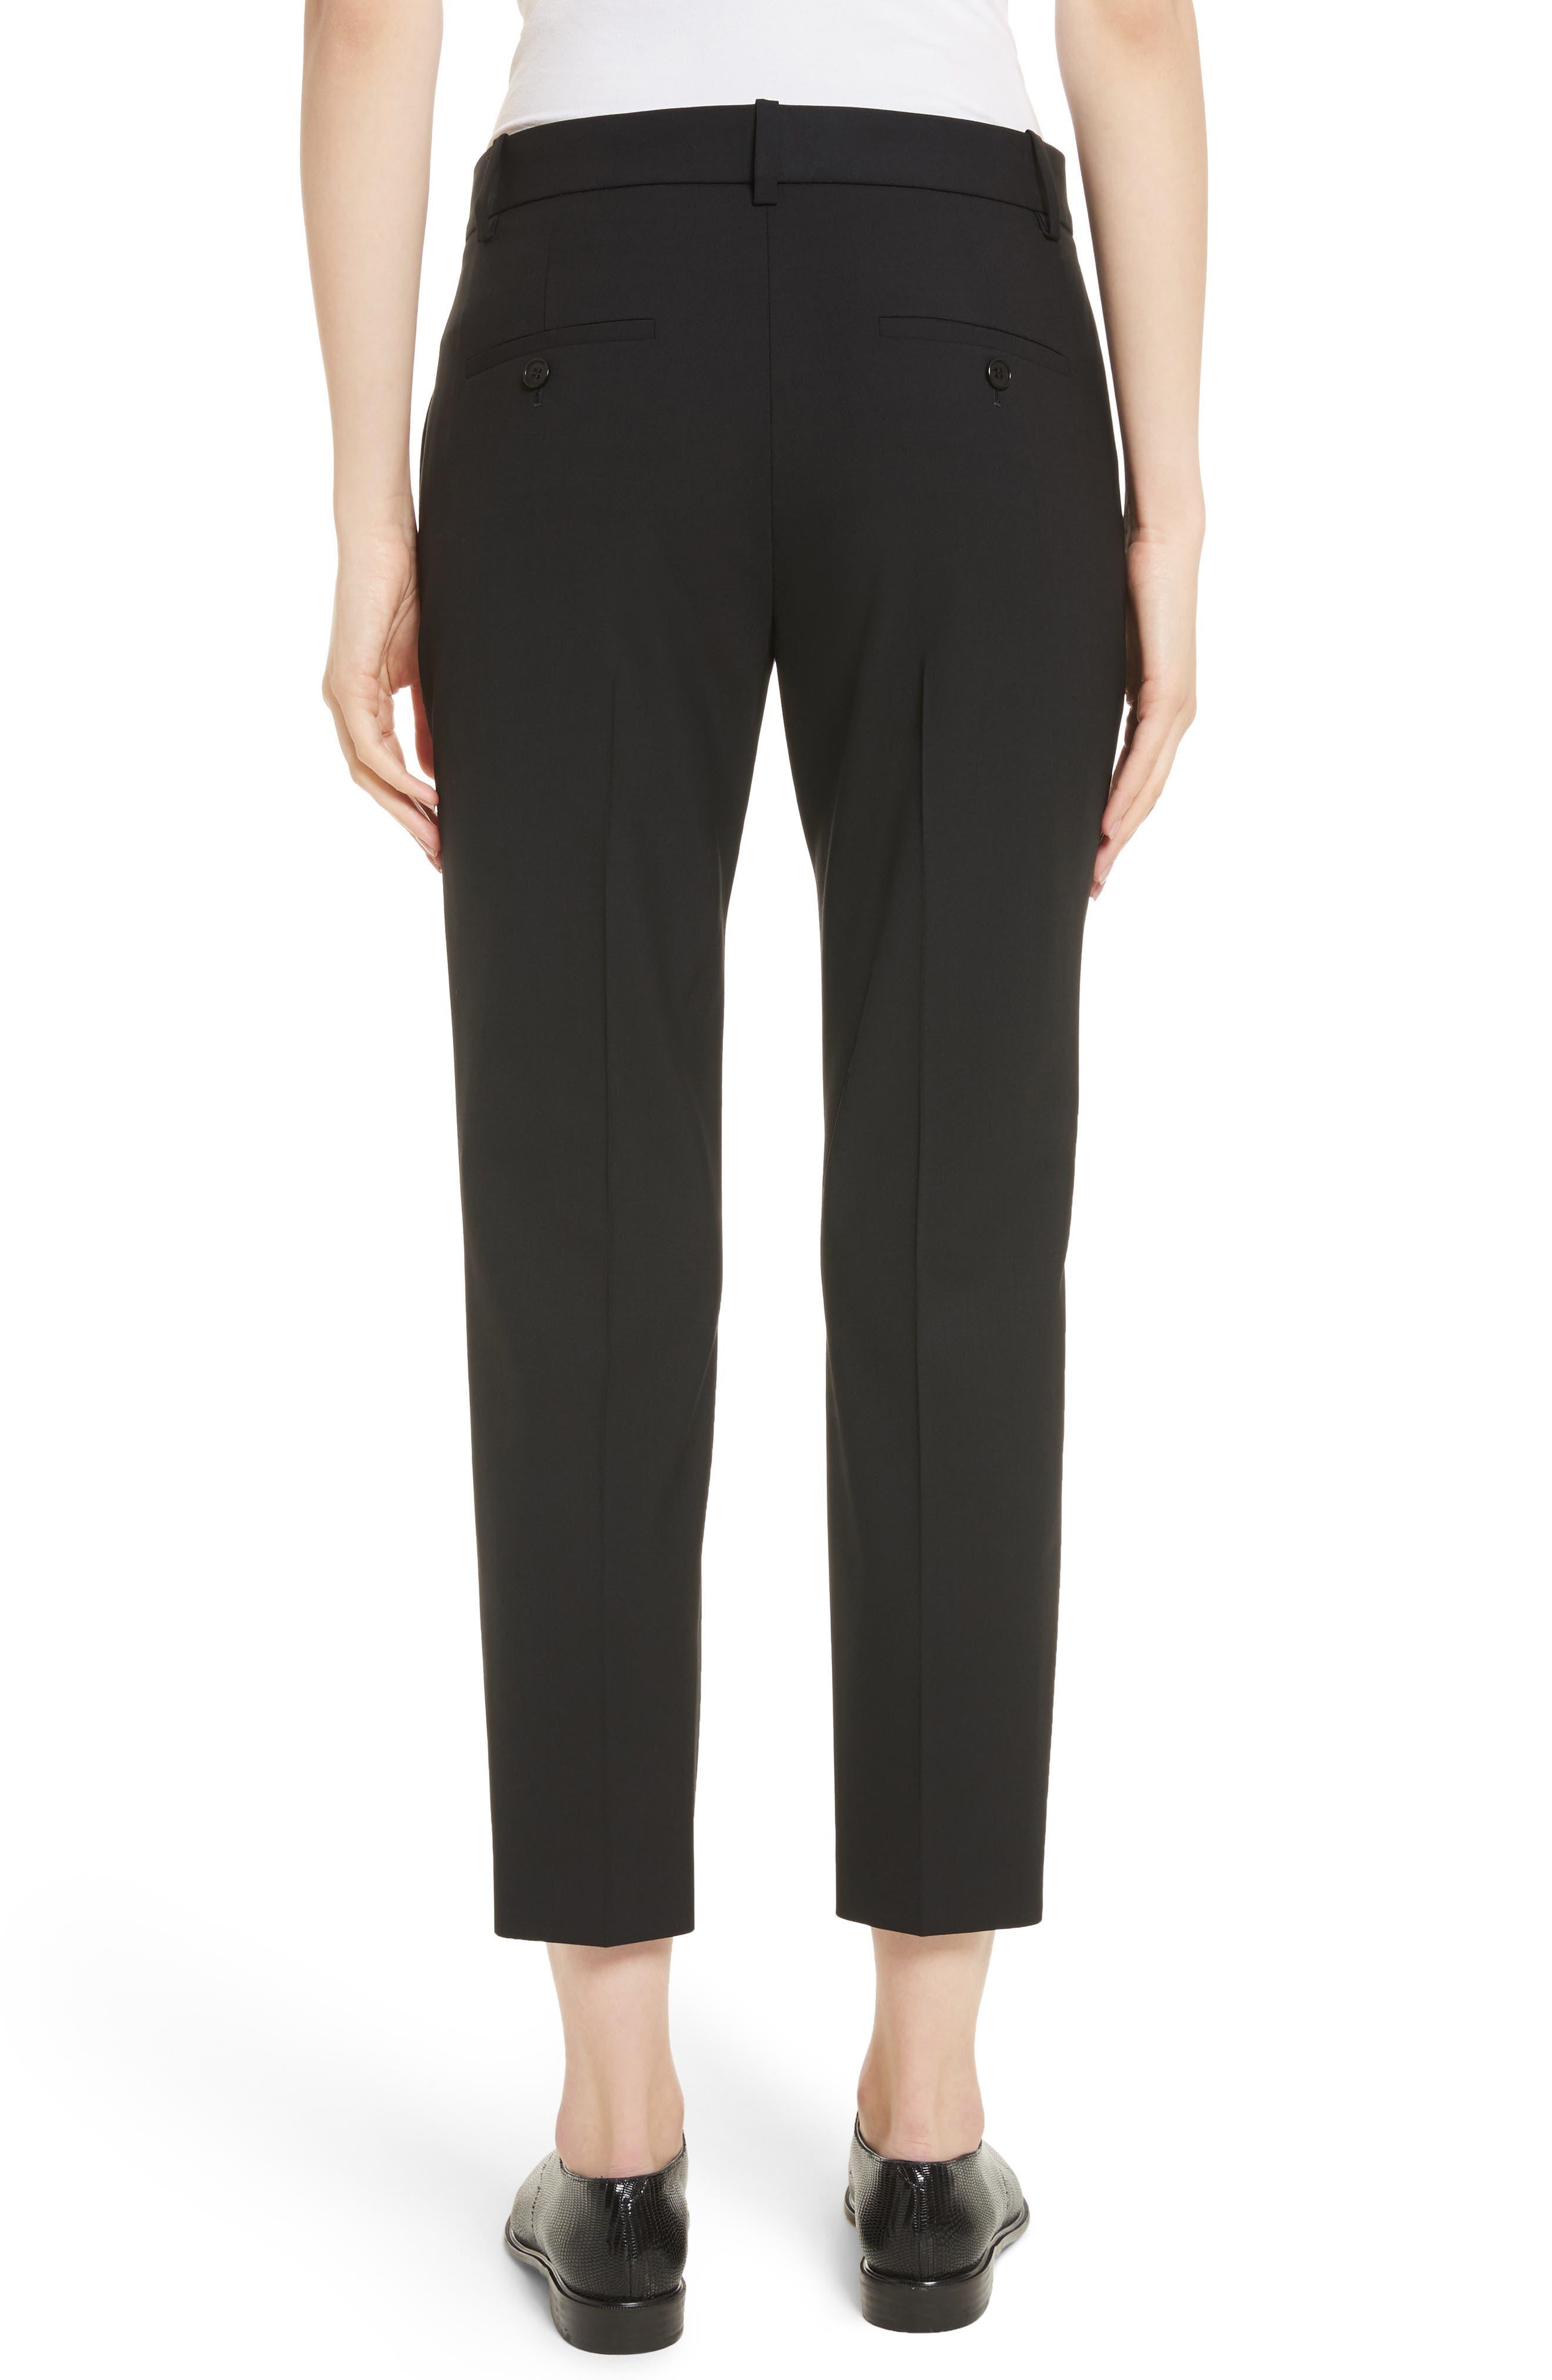 THEORY, Treeca 2 Good Wool Crop Suit Pants, Alternate thumbnail 2, color, BLACK